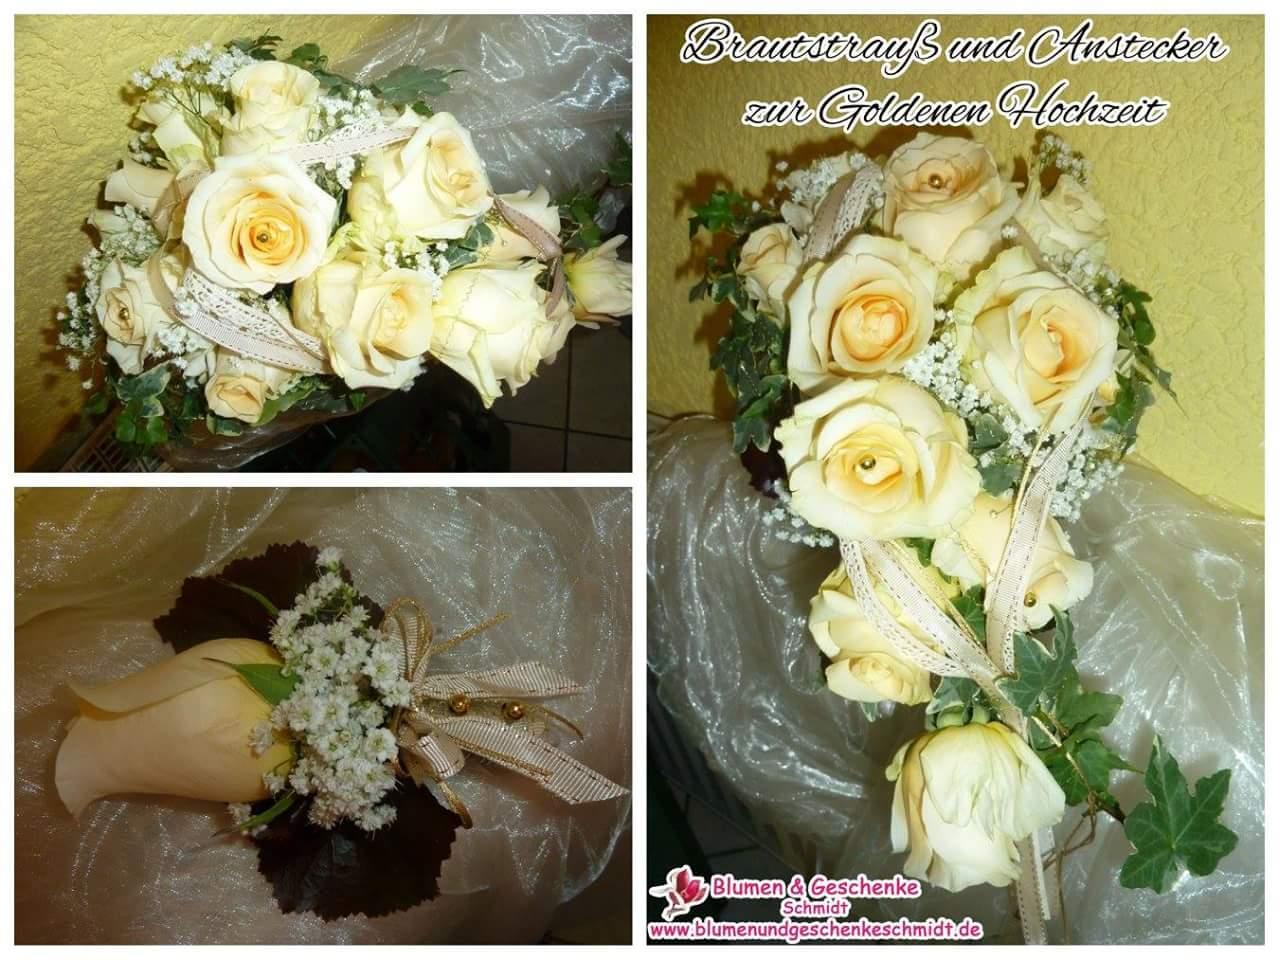 Floristik Blumen Geschenke Schmidt